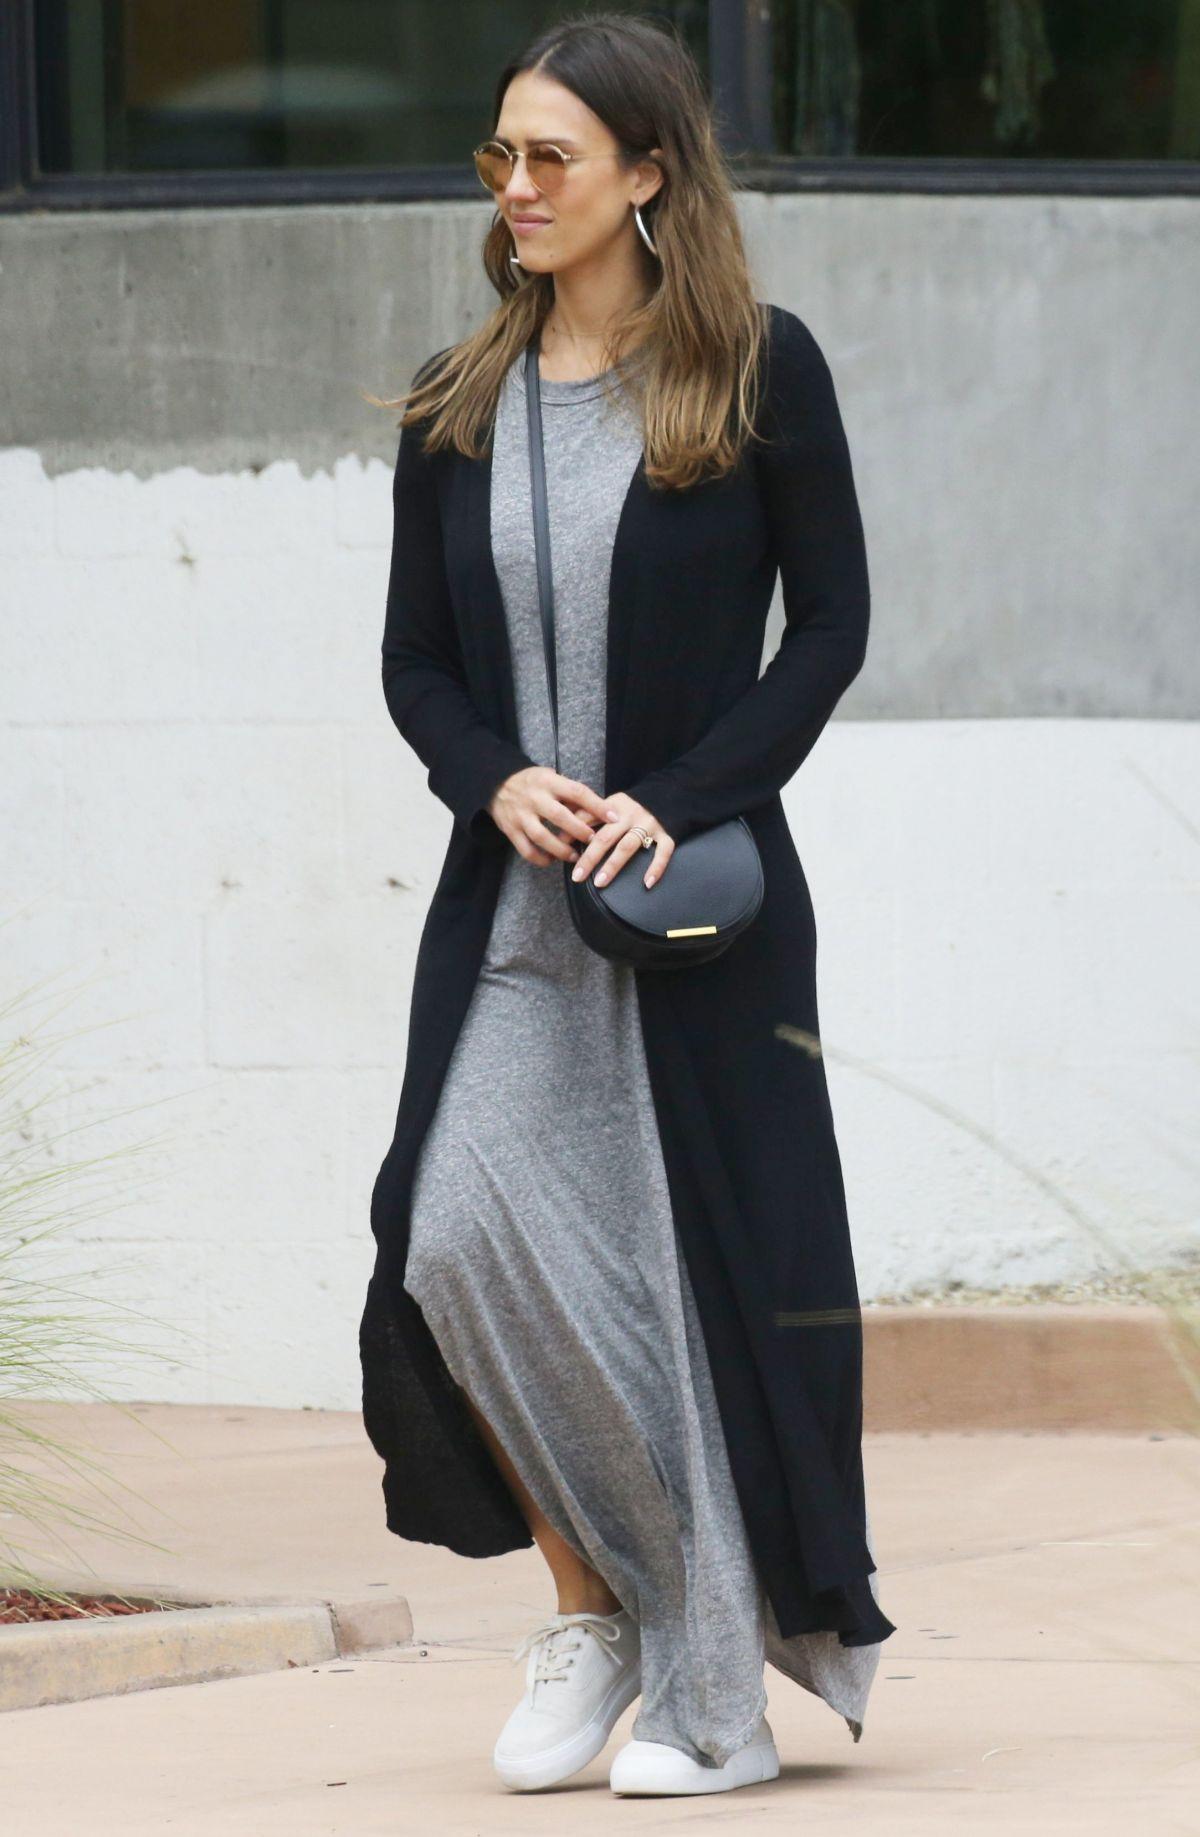 Jessica Alba Out And About In Malibu 07 01 2017 Zune2016